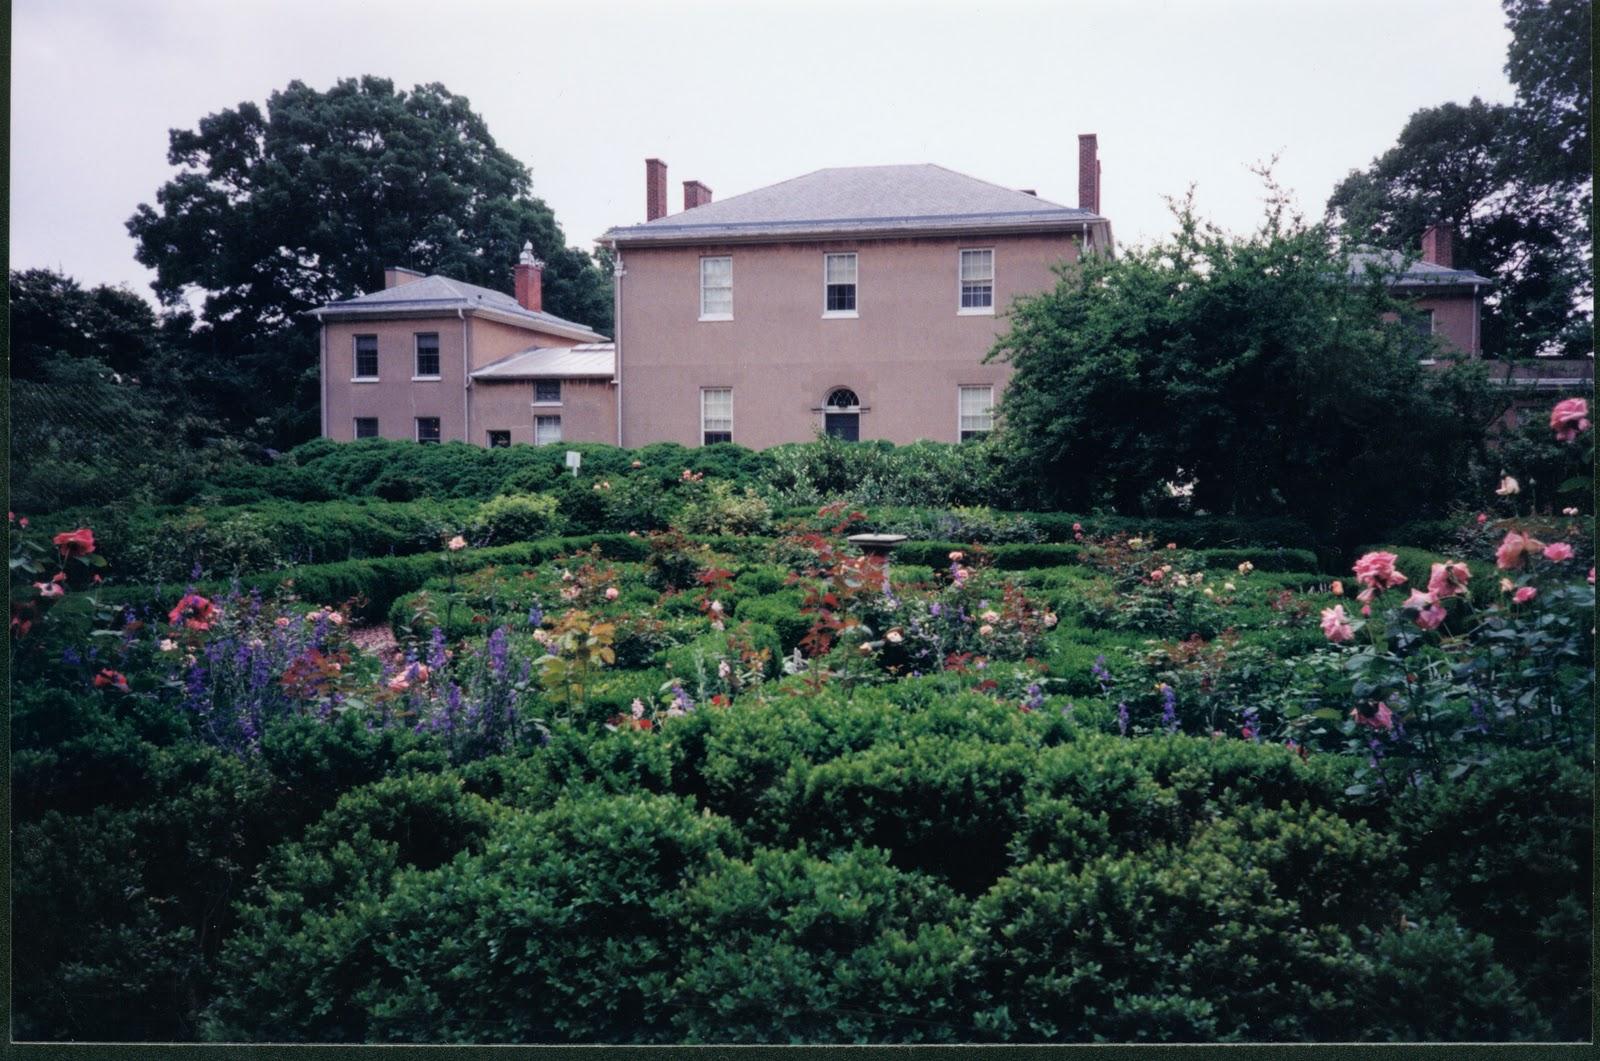 Shovel ready knot garden restoration underway tudor Tudor place historic house and garden